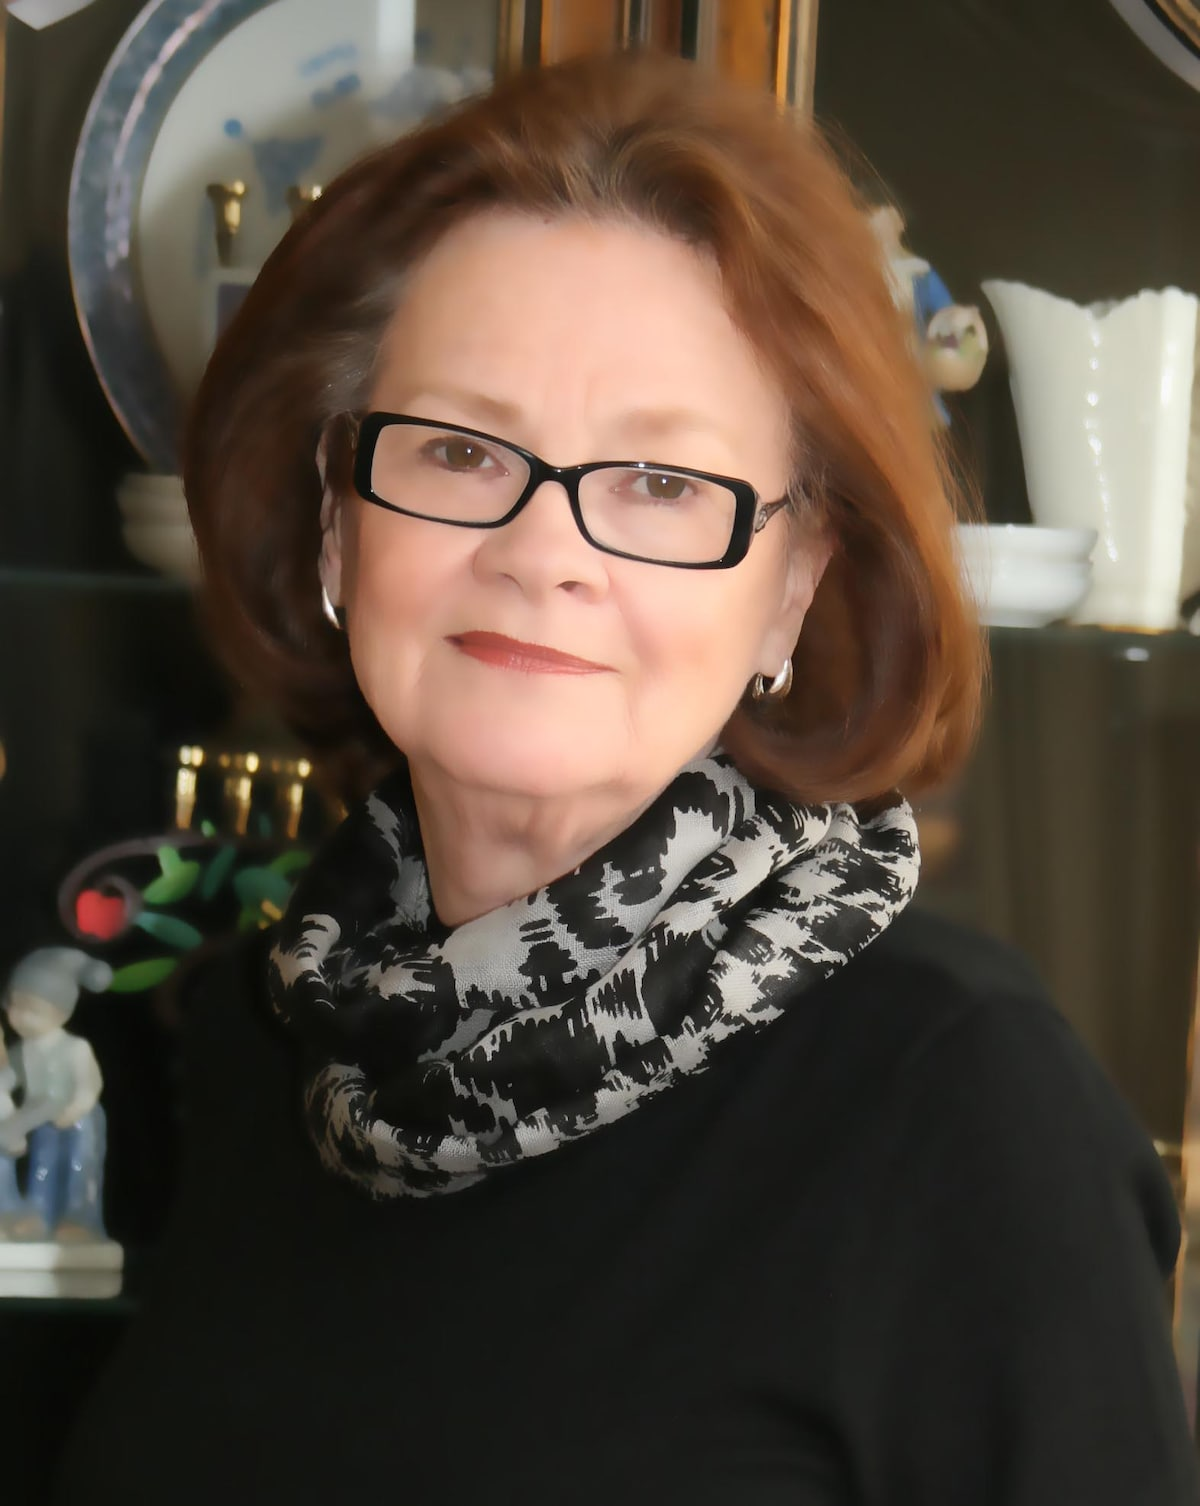 Linda From Birmingham, AL